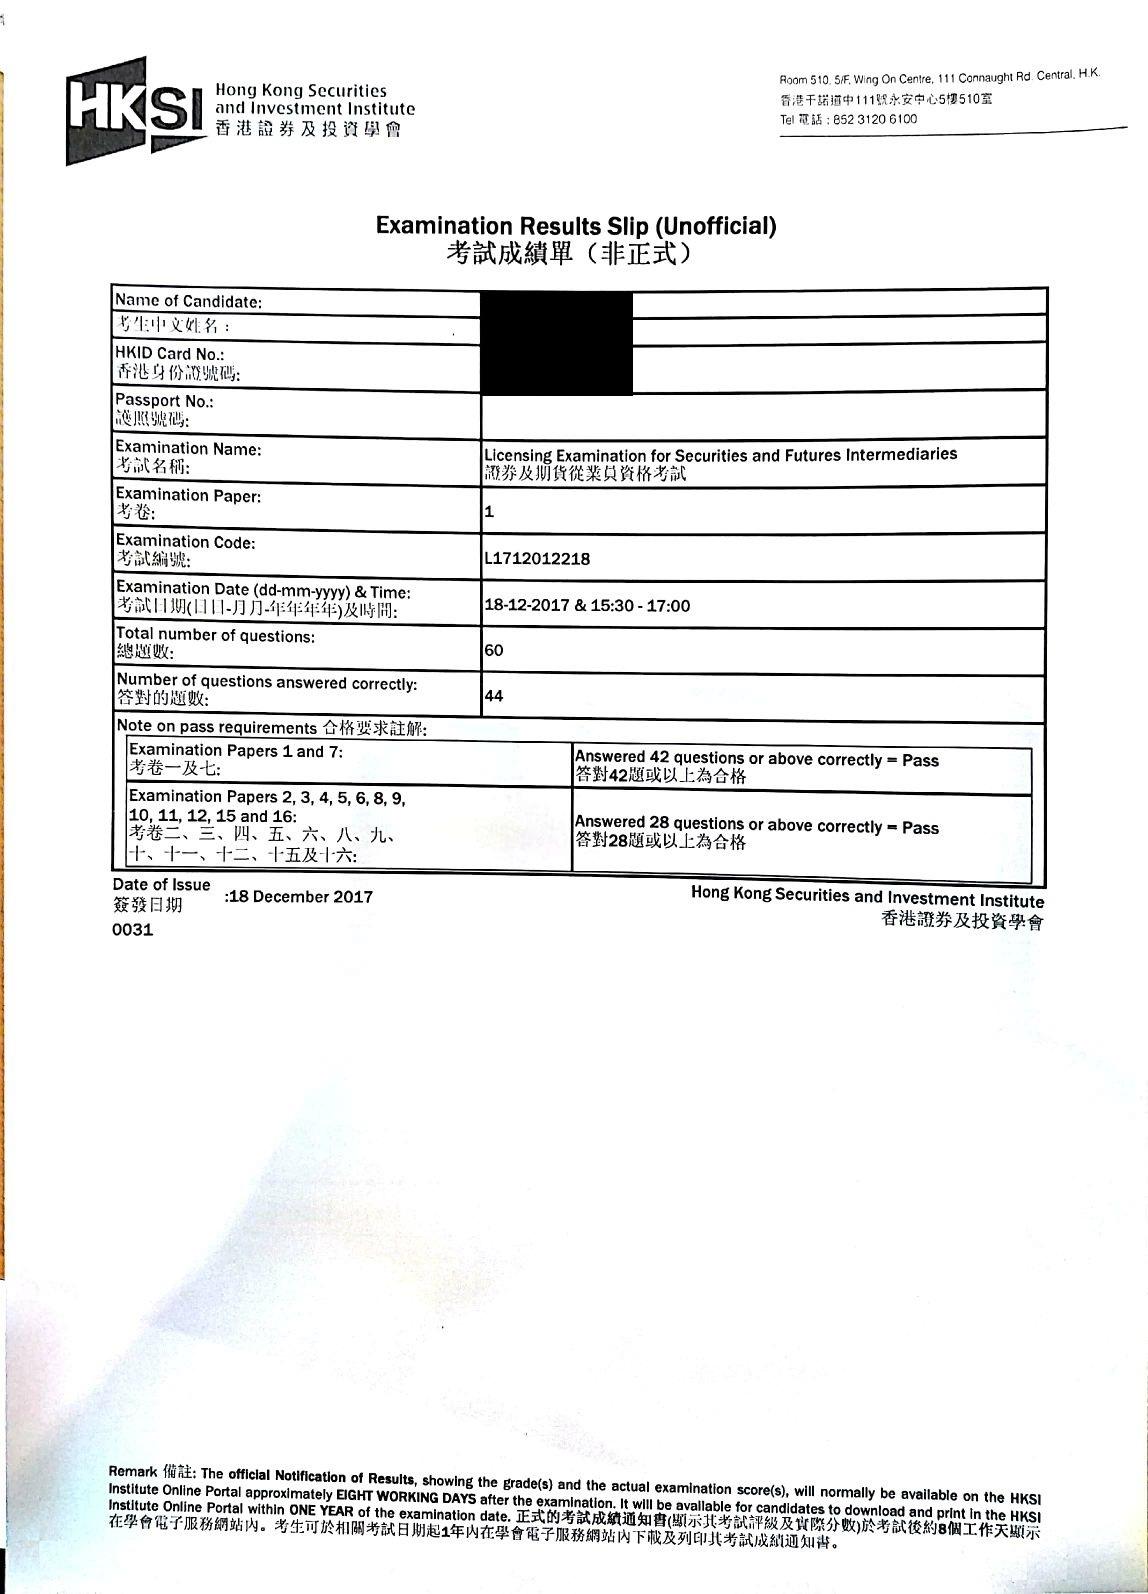 SCH 18/12/2017 LE Paper 1 證券期貨從業員資格考試卷一 Pass